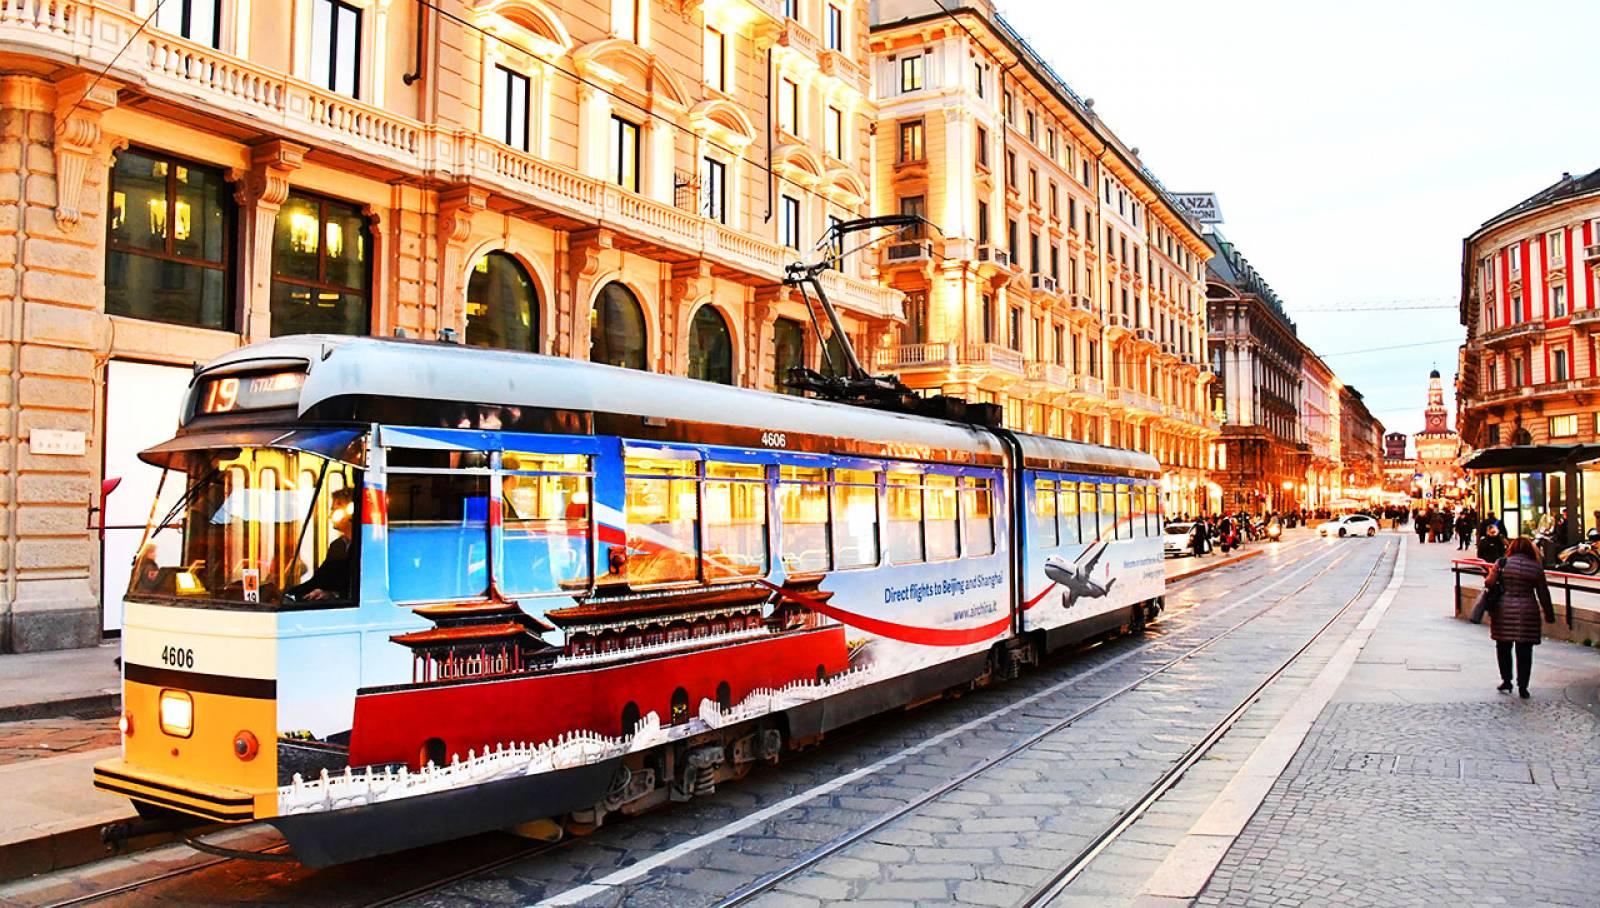 Pubblicità su tram IGPDeacux Milano tram decorato per Air China